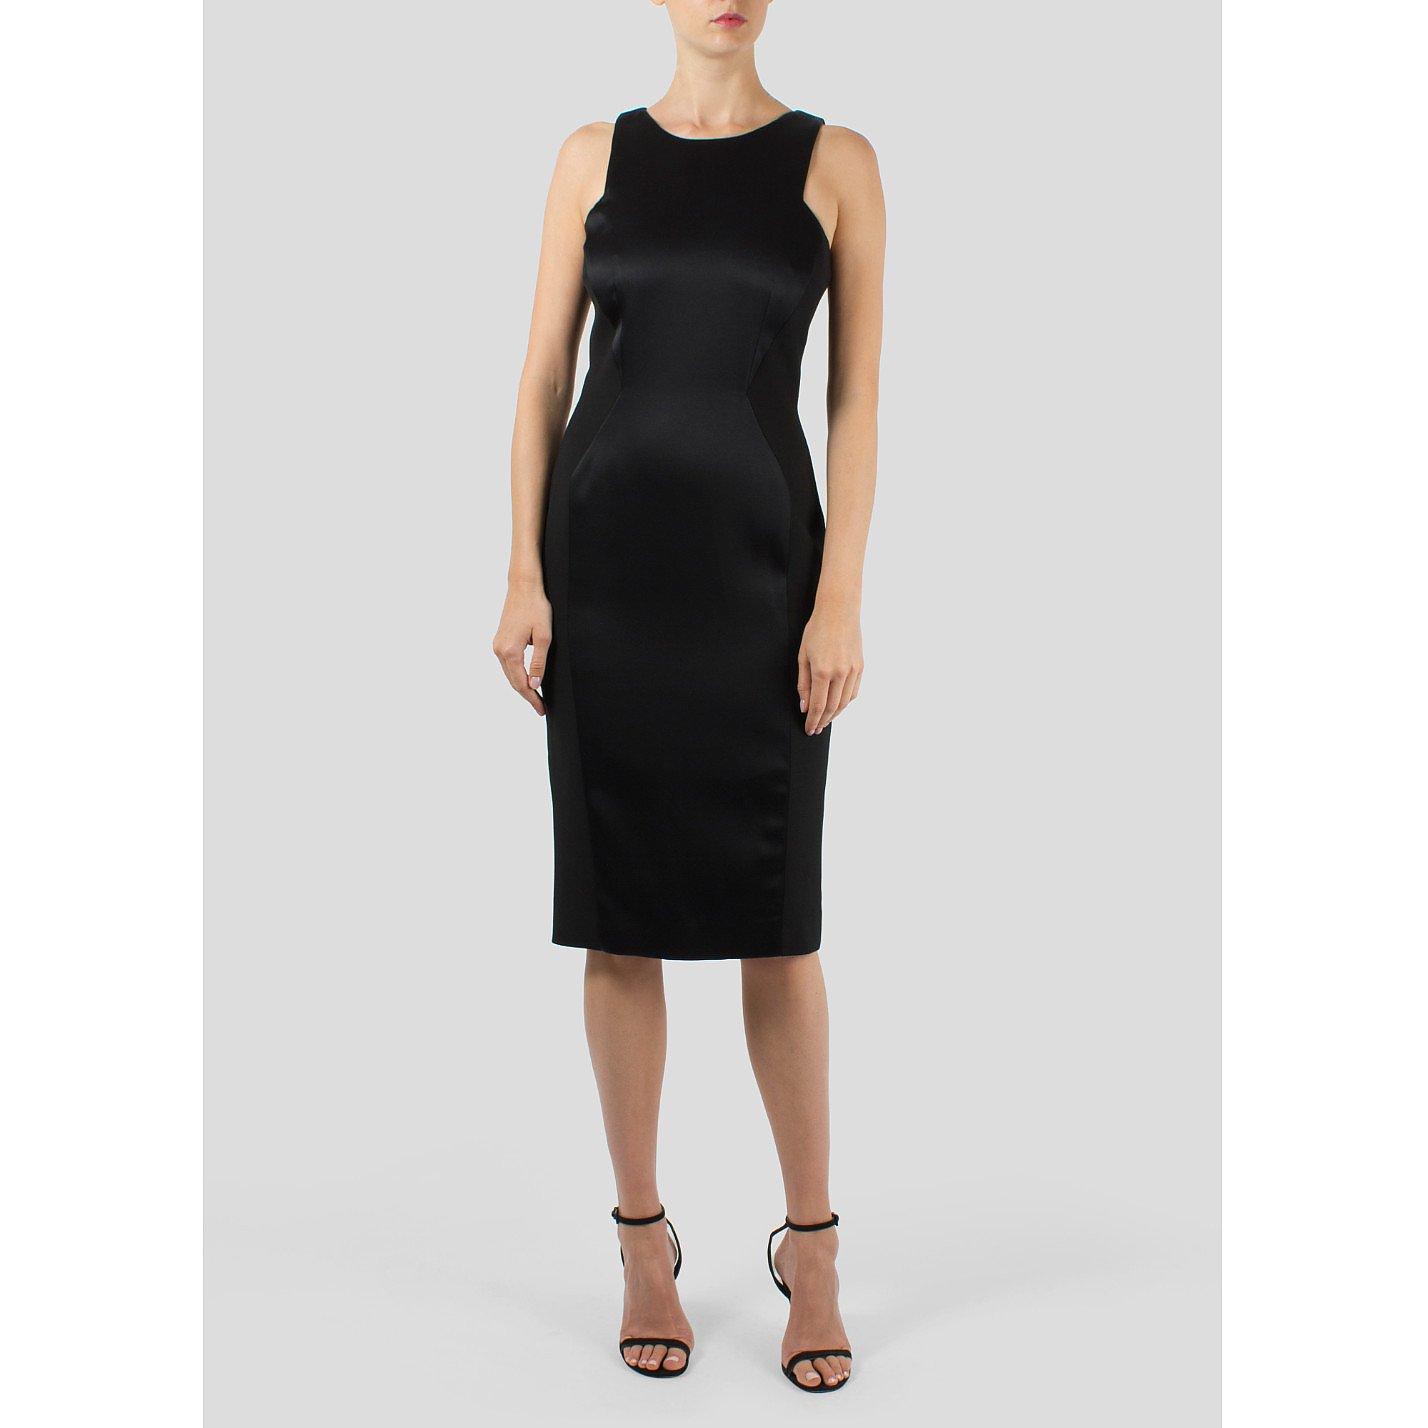 Amanda Wakeley Sleeveless Shift Midi Dress